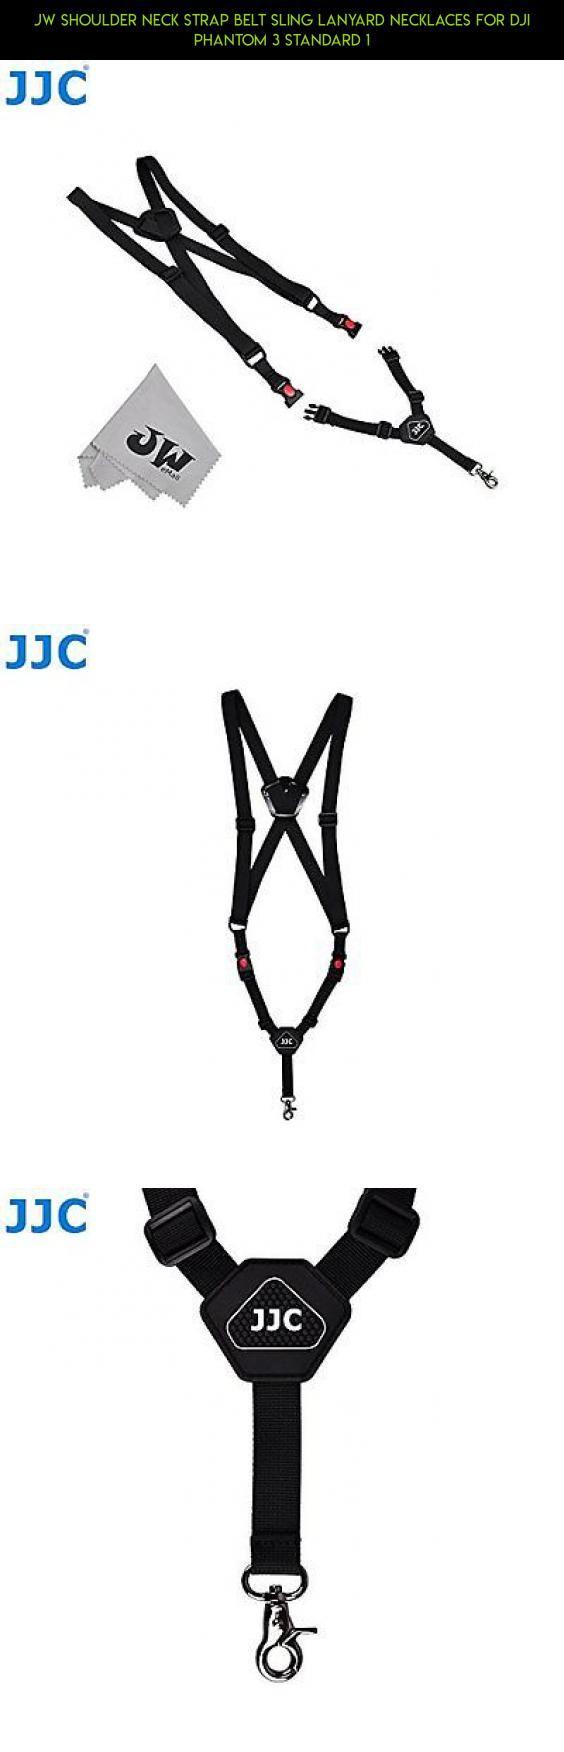 JW Shoulder Neck Strap Belt Sling Lanyard Necklaces For DJI Phantom 3 Standard 1 #products #3 #technology #fpv #phantom #drone #camera #racing #standard #tech #gadgets #shopping #dji #parts #kit #plans #lanyard